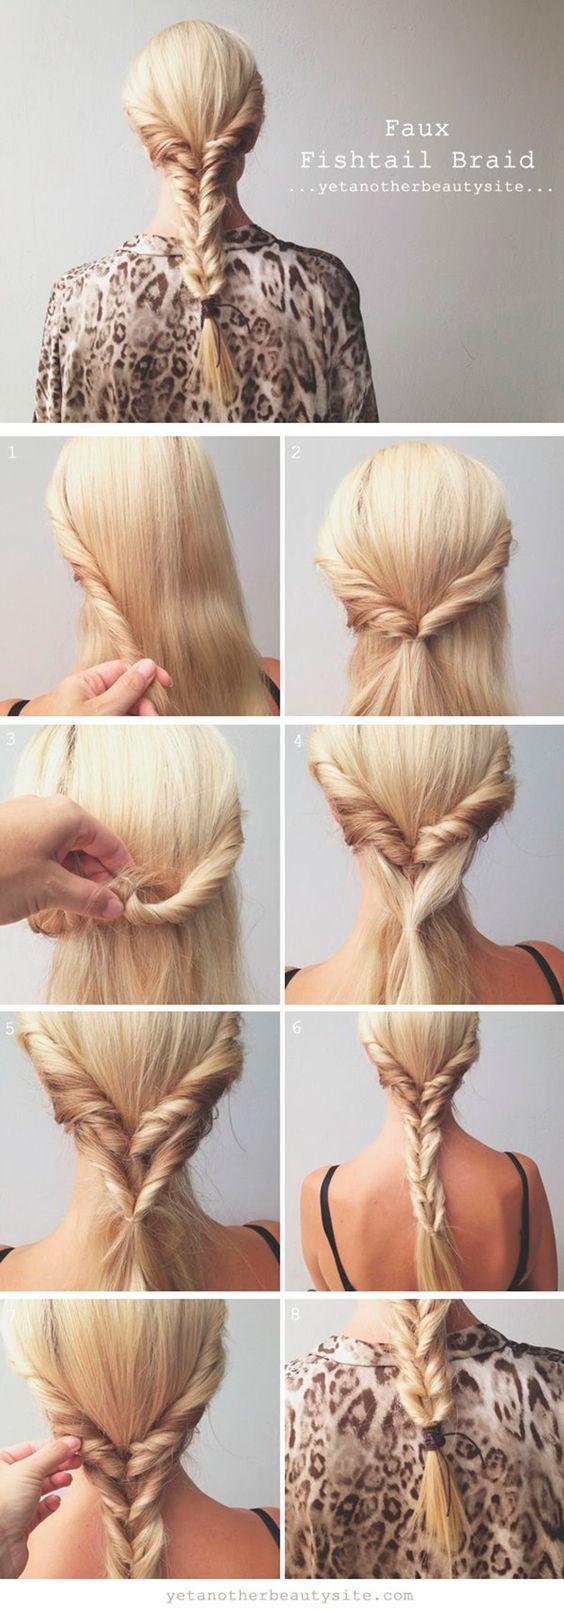 diy-penteados-simples-natal-3